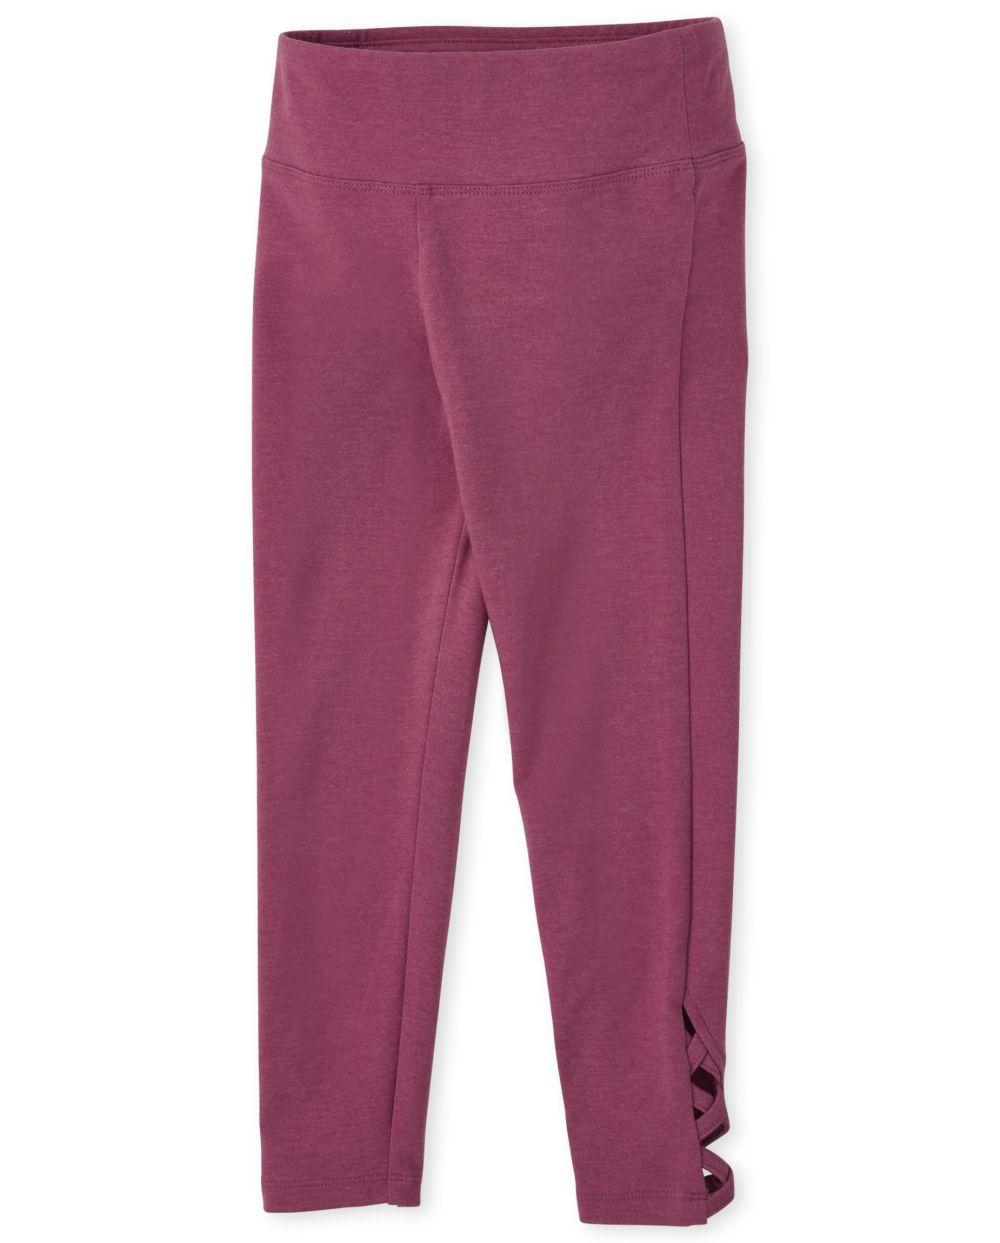 Girls Lace-Up Leggings - Pink